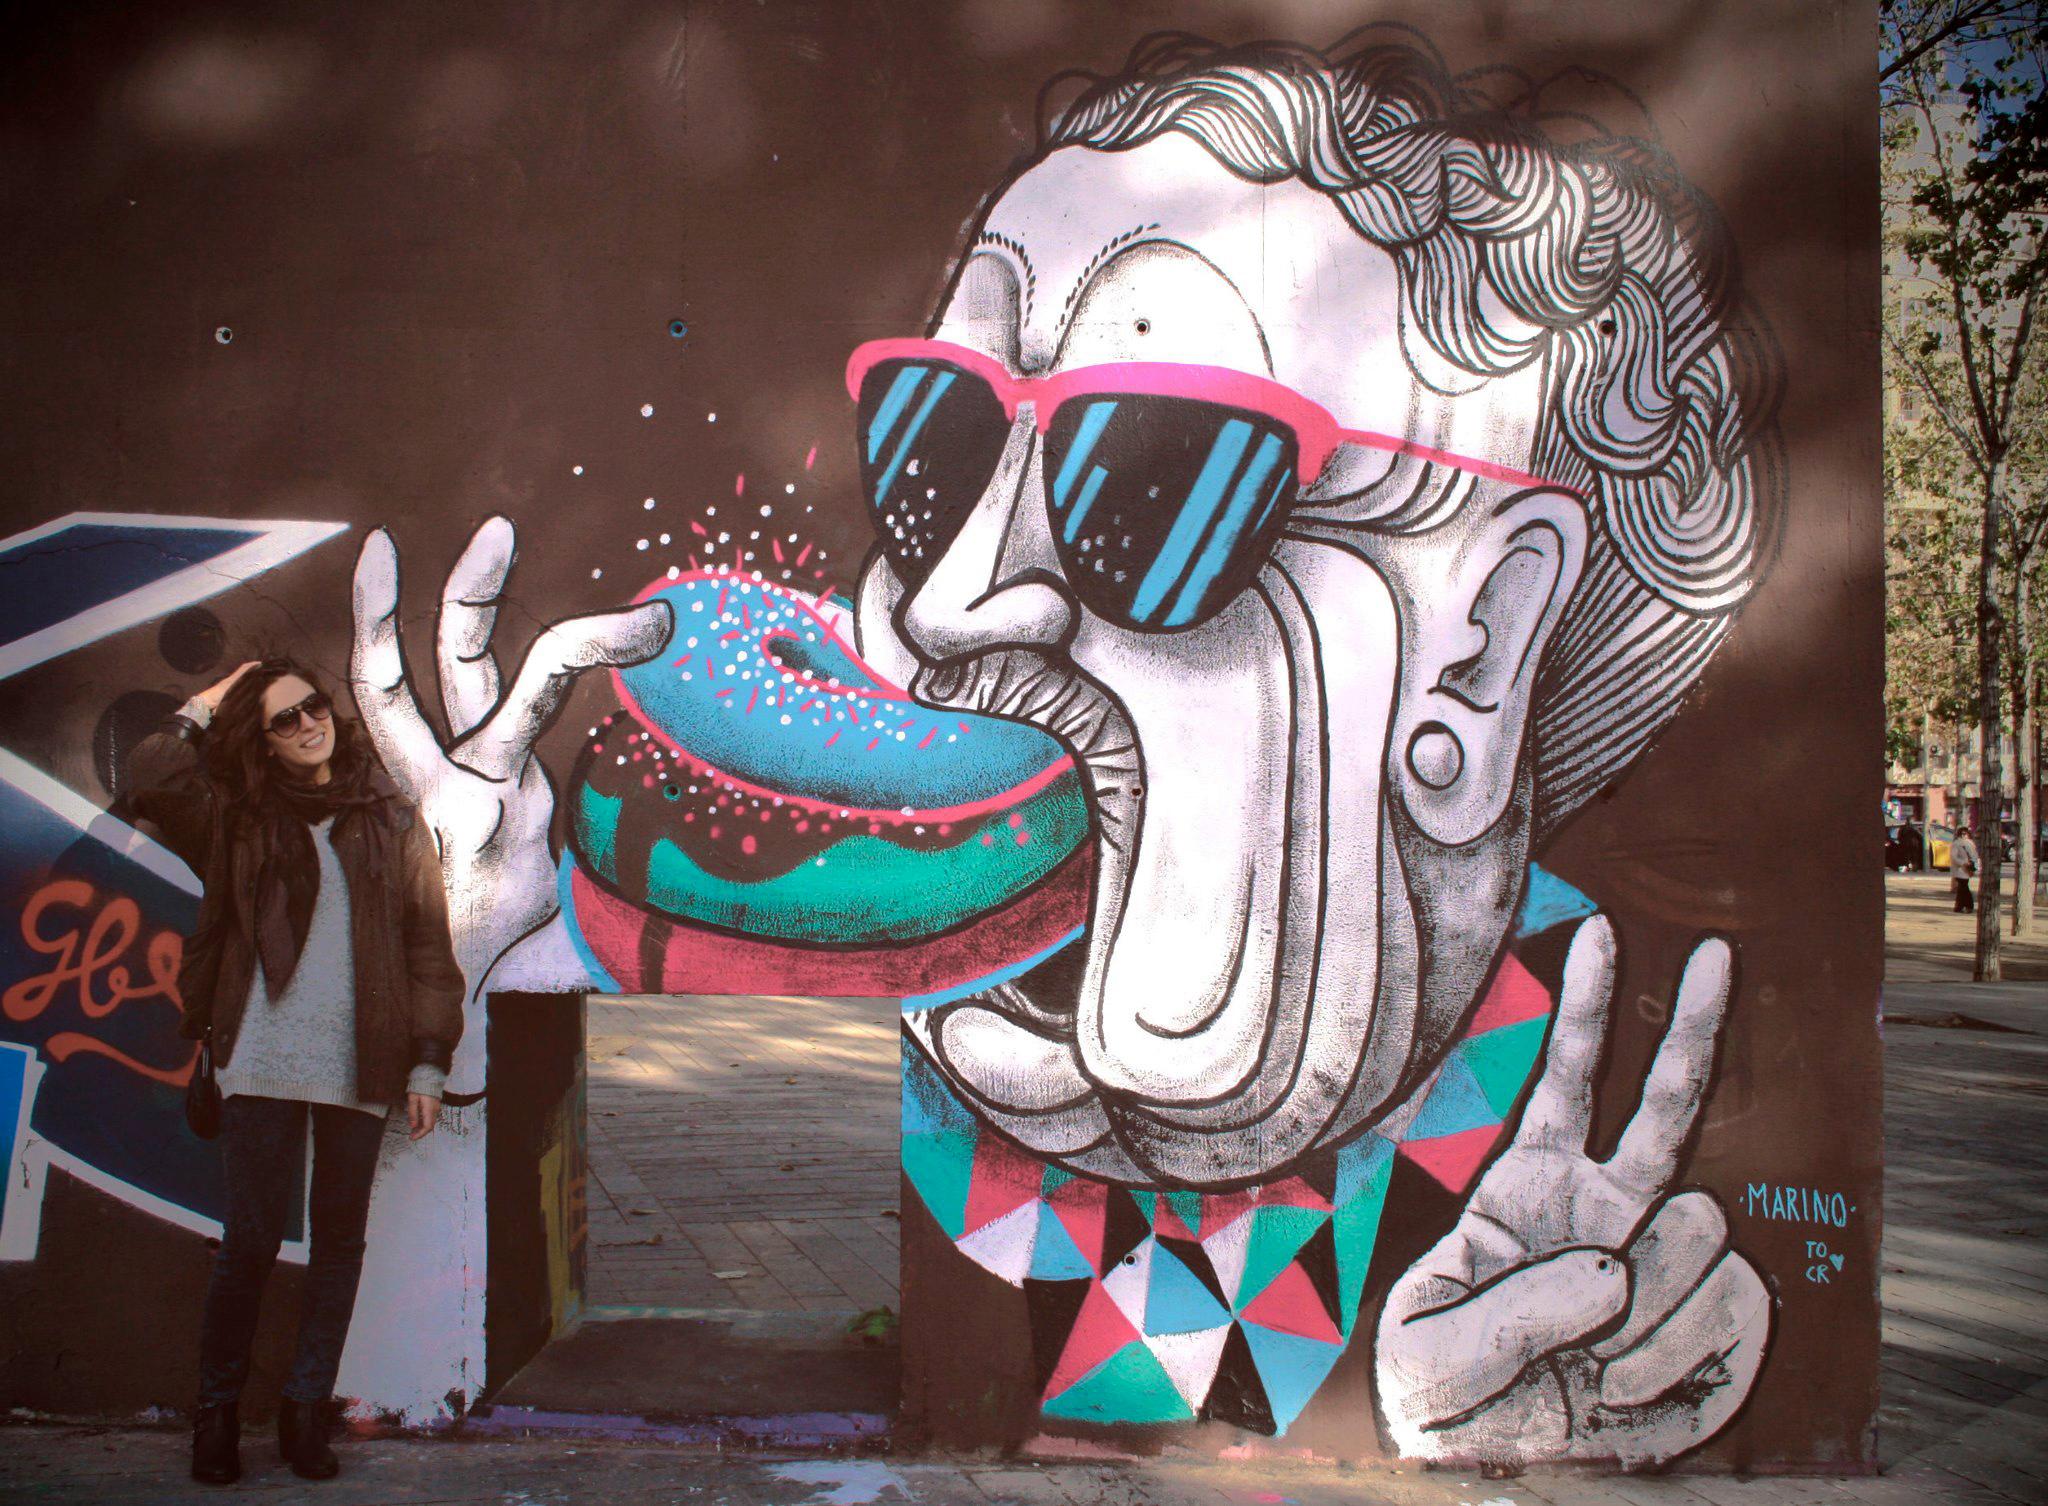 Mural painted at 3 Xemeneies park, Barcelona 2014